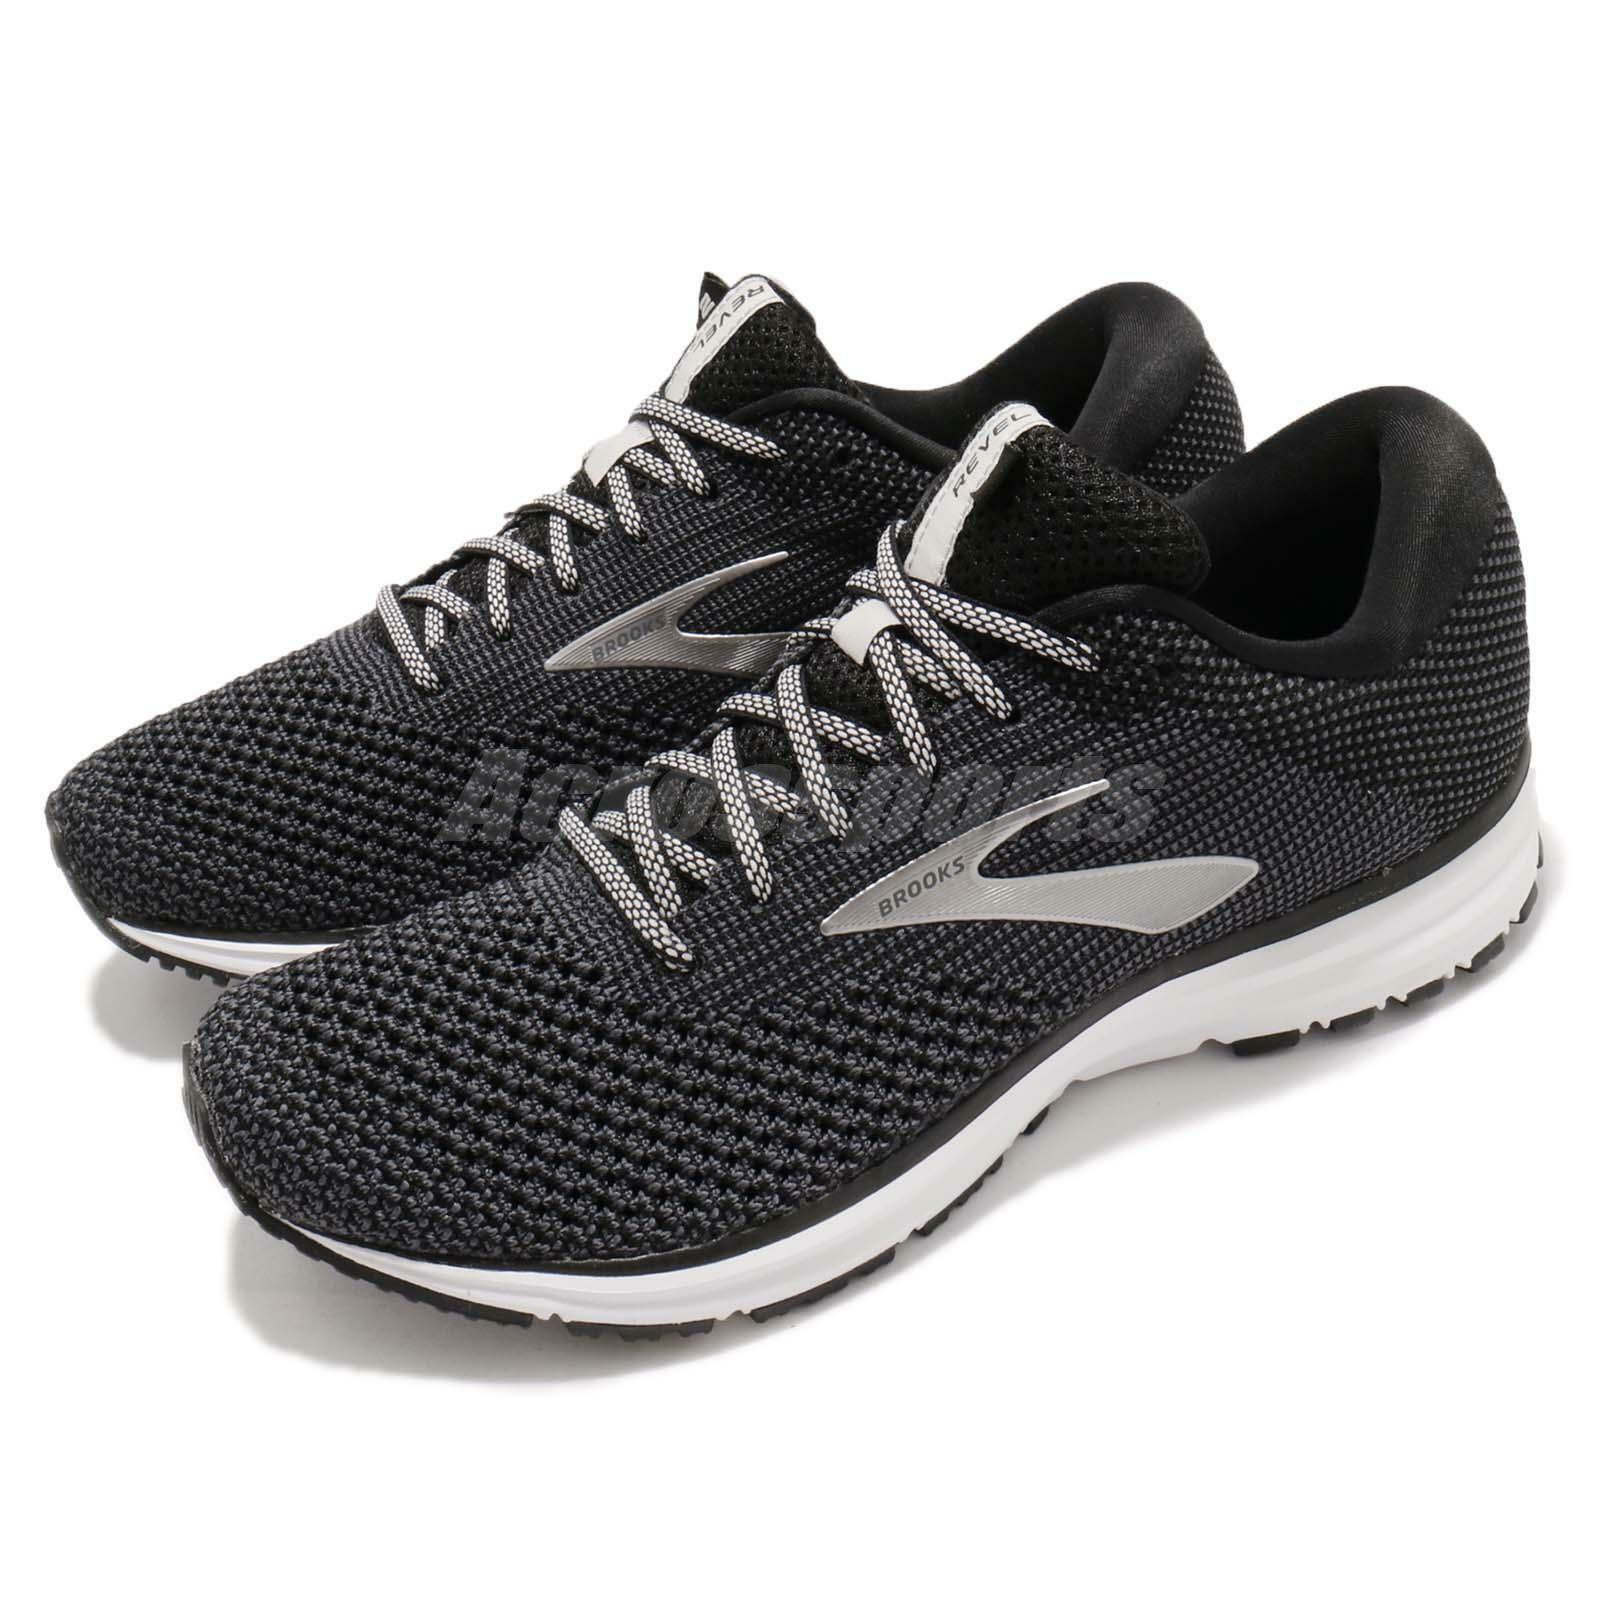 Brooks Revel 2 negro gris blanco Men Running Training zapatos zapatillas 110292 1D